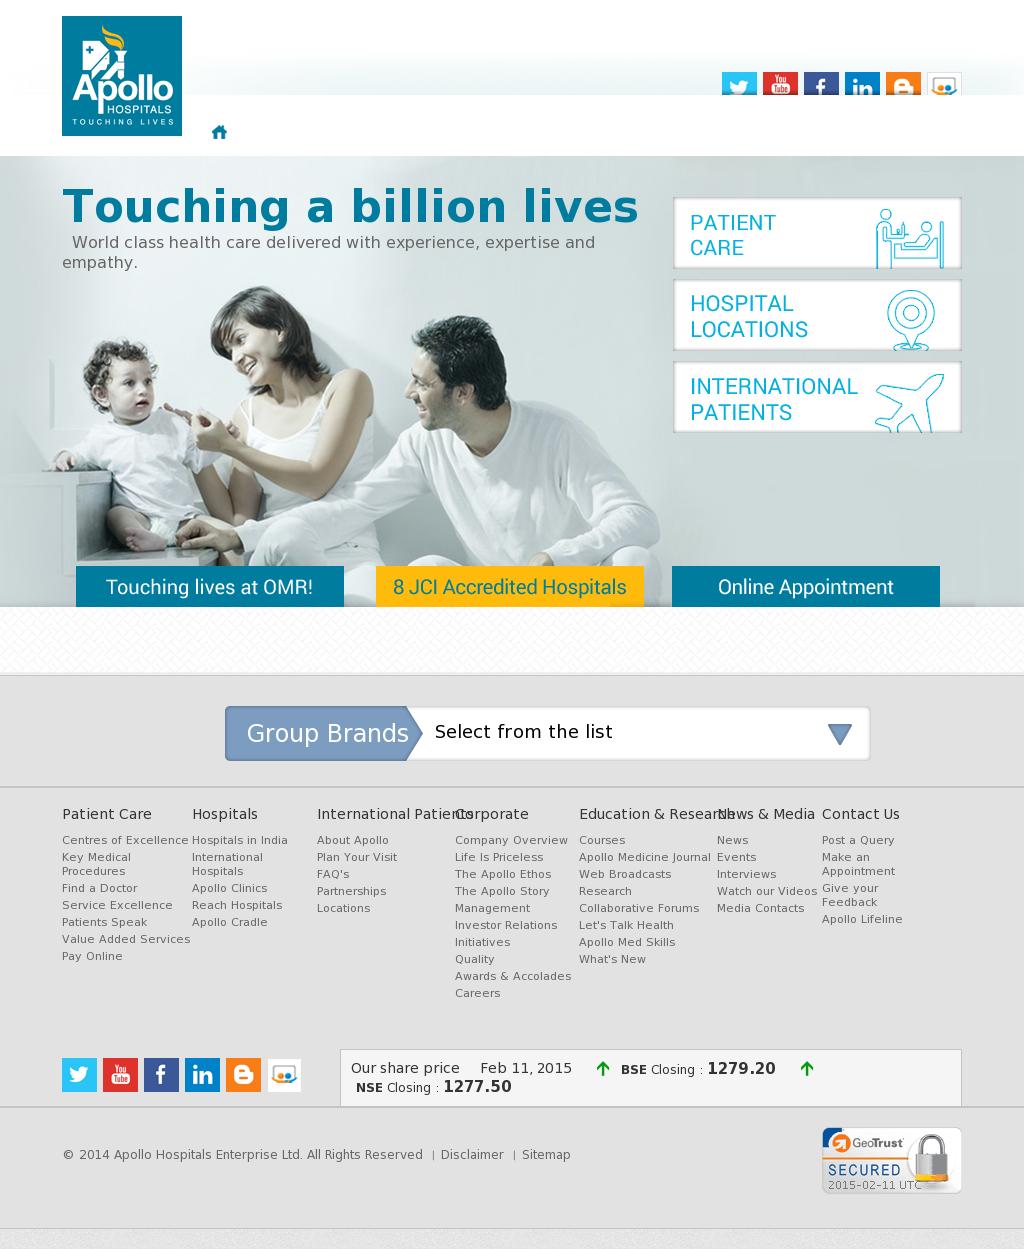 Apollo Hospitals Competitors, Revenue and Employees - Owler Company